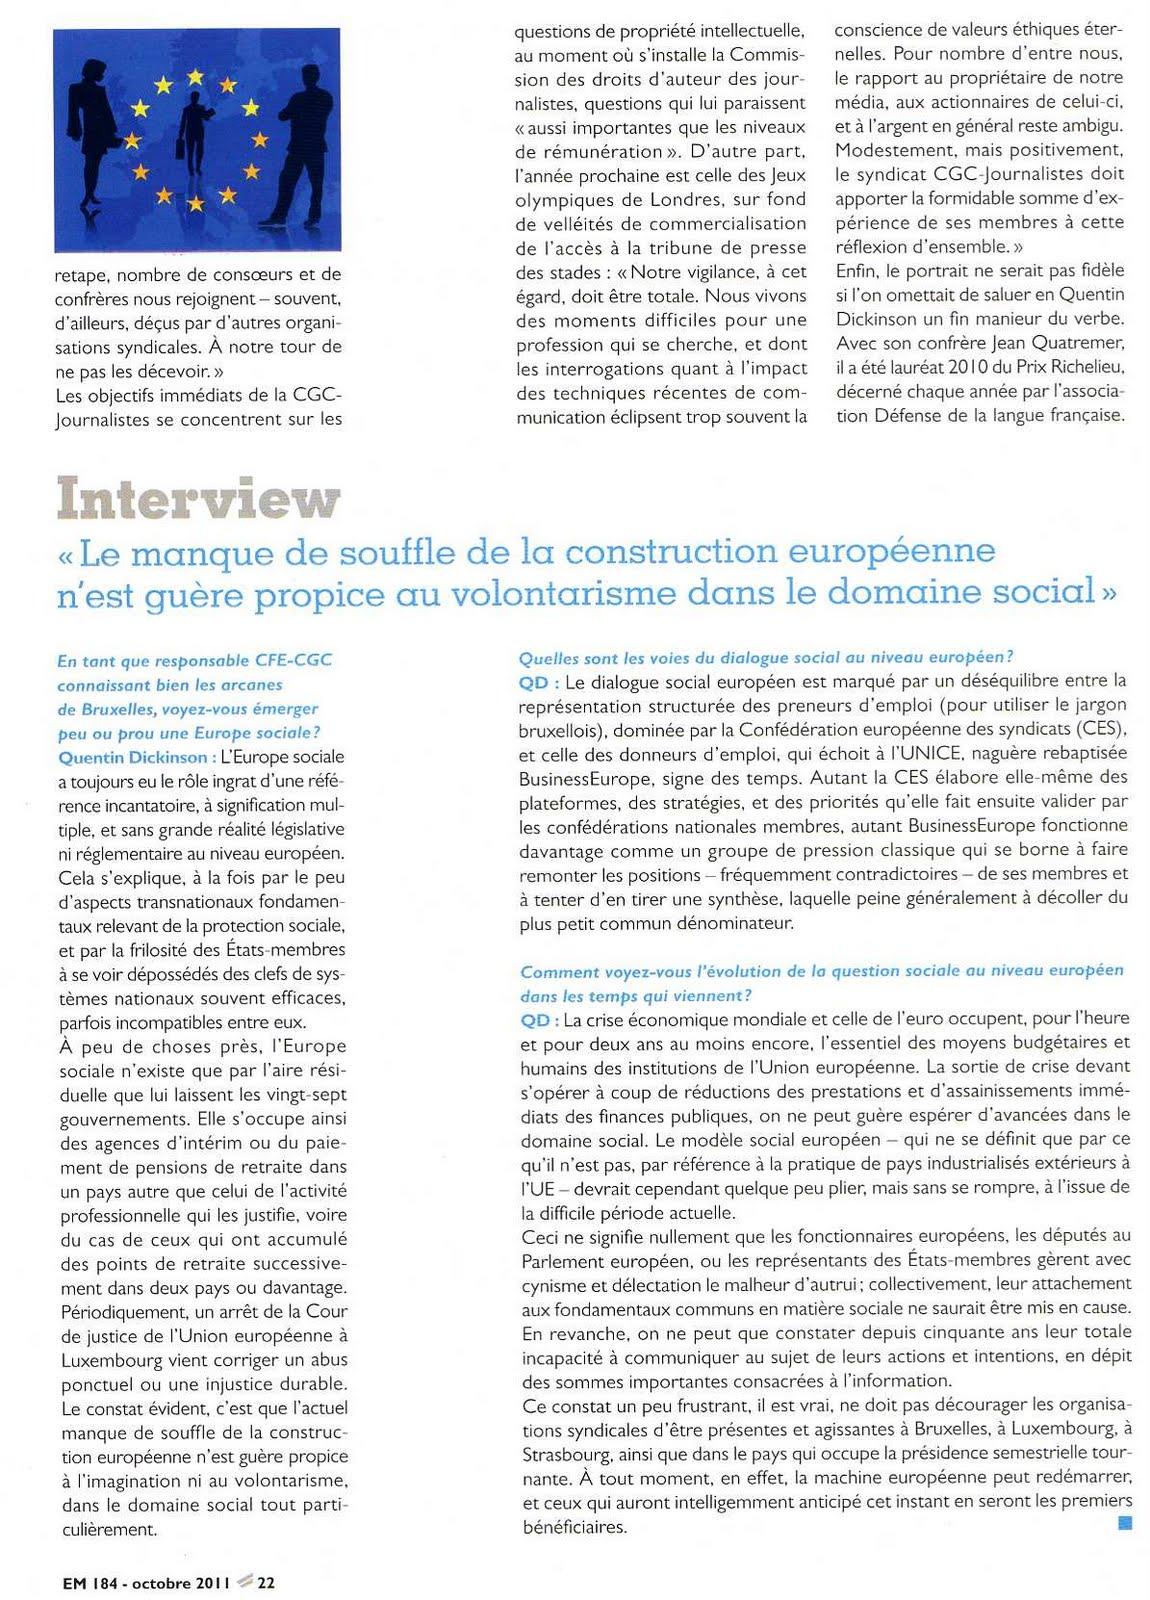 SNPCA - CFE-CGC Radio France: Quentin Dickinson ...